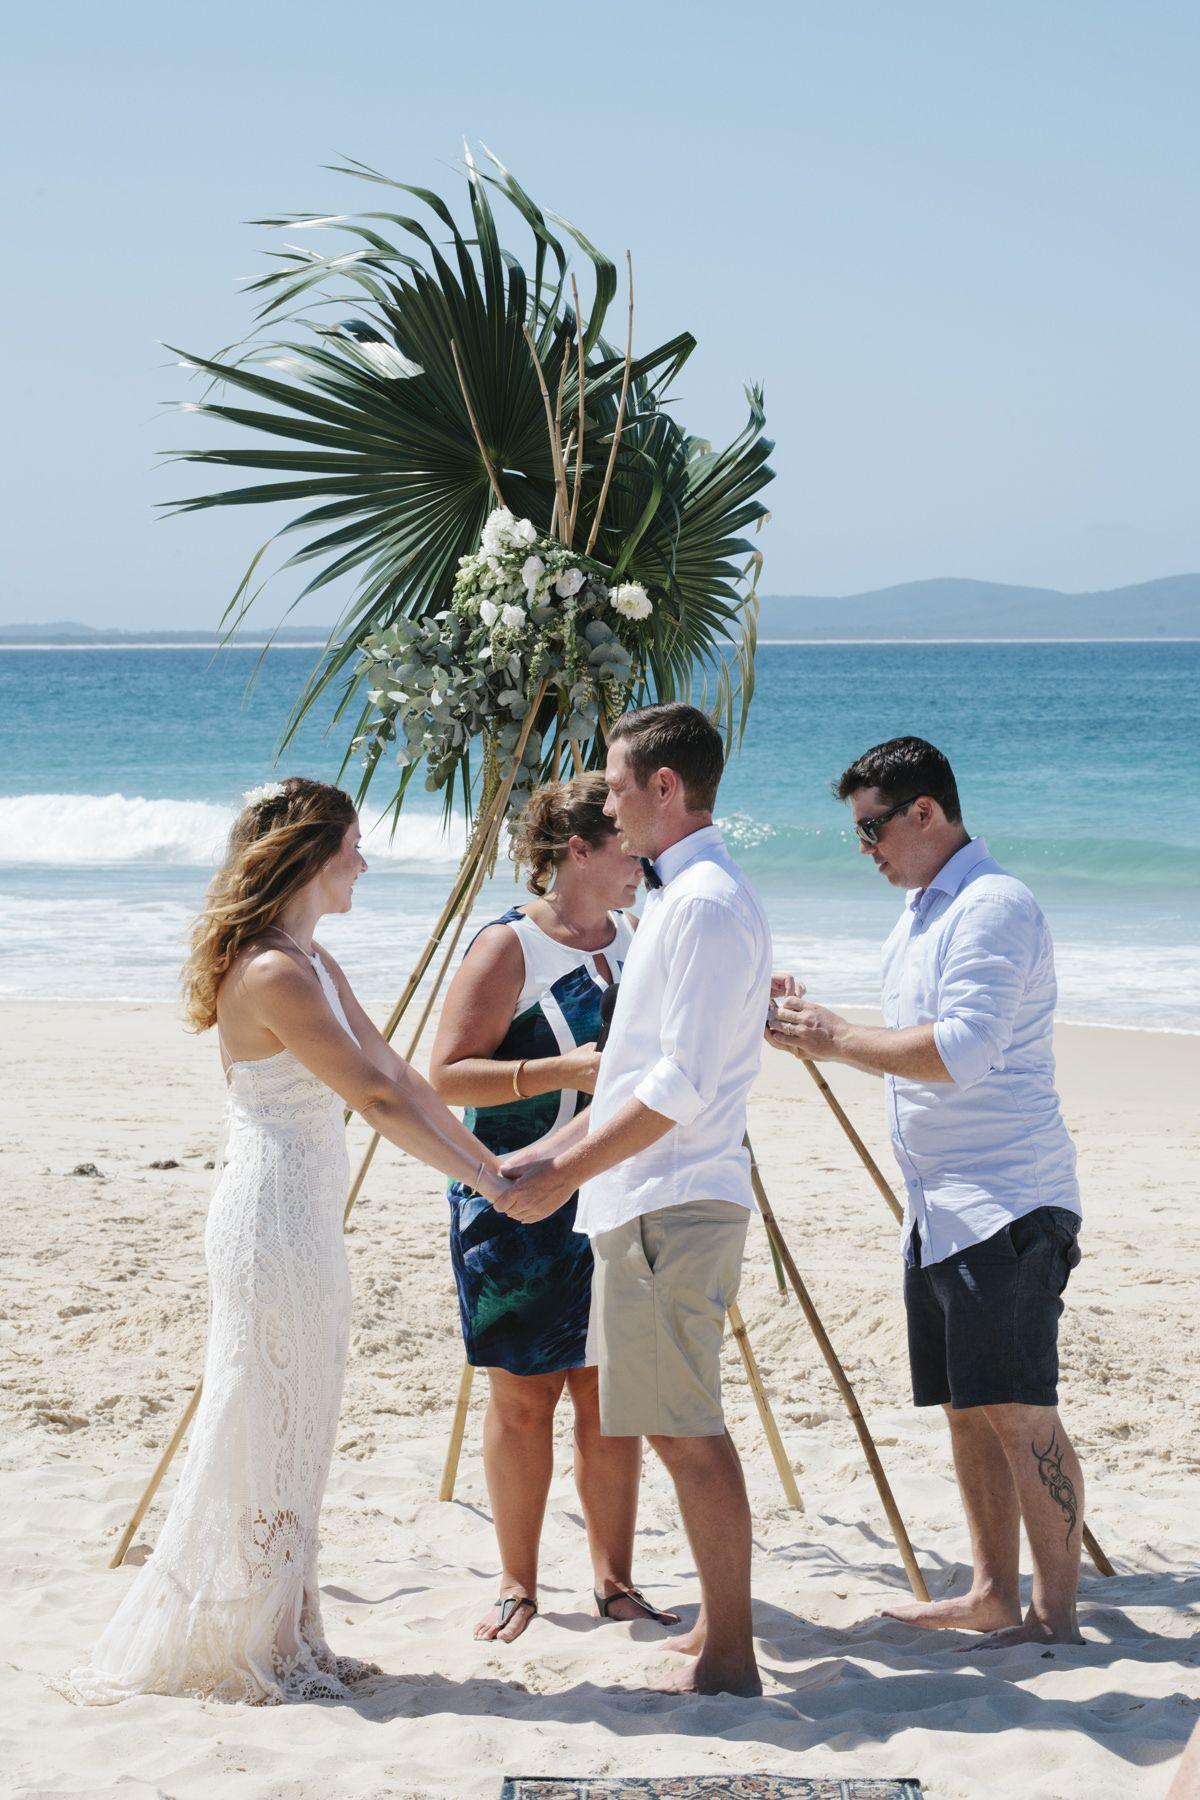 Karin & Daniel's Relaxed Beachside Fiesta Wedding Beach